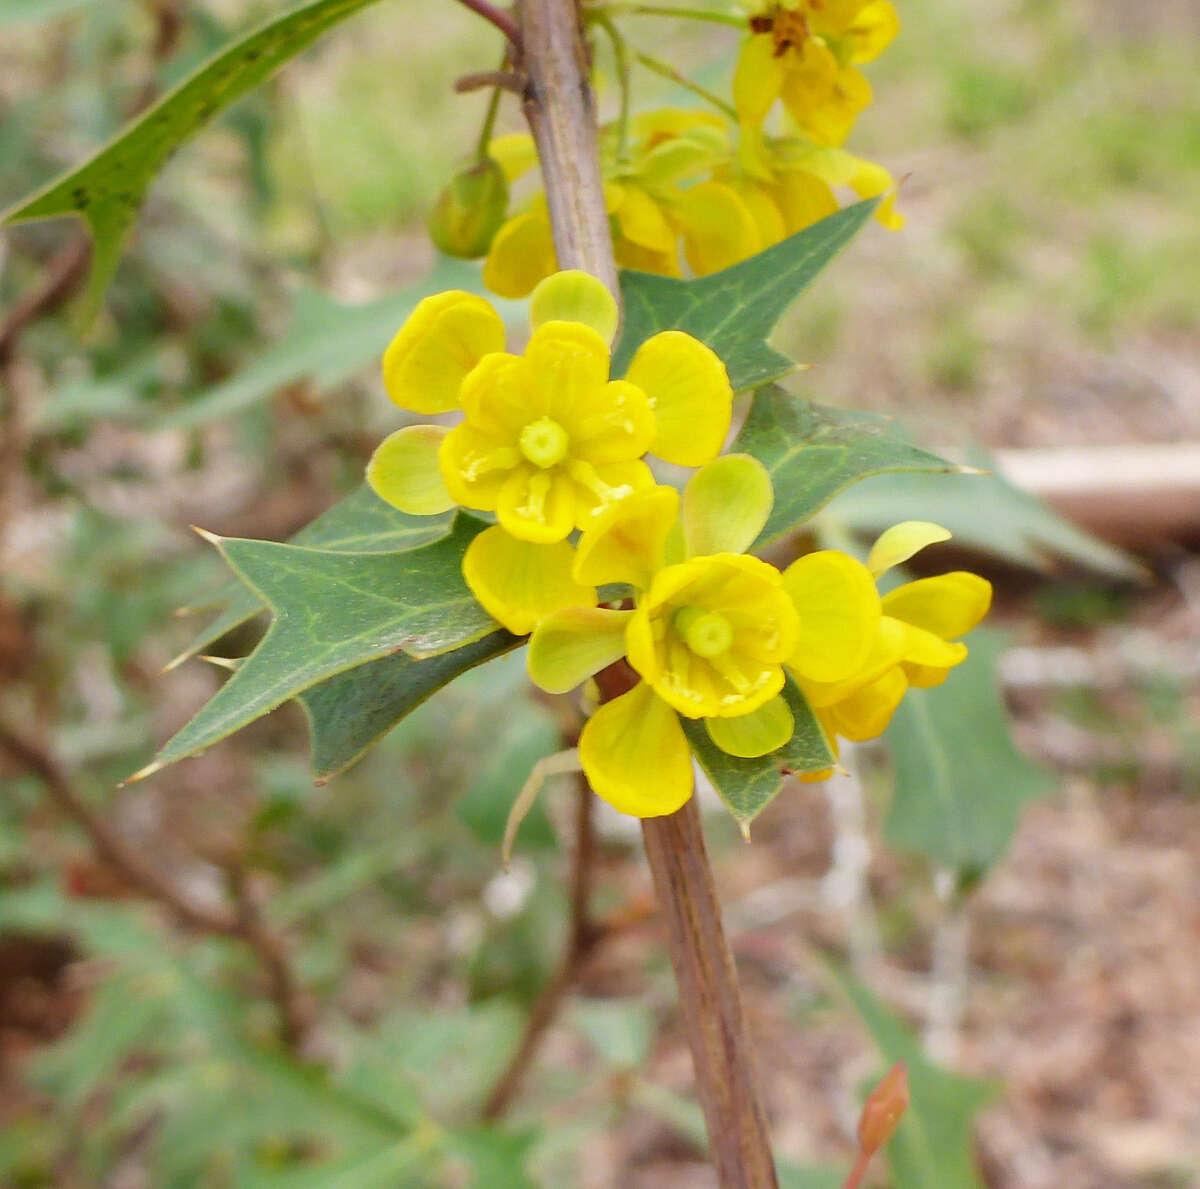 Native agarita shrubs are among the earliest blooming plants across Texas.